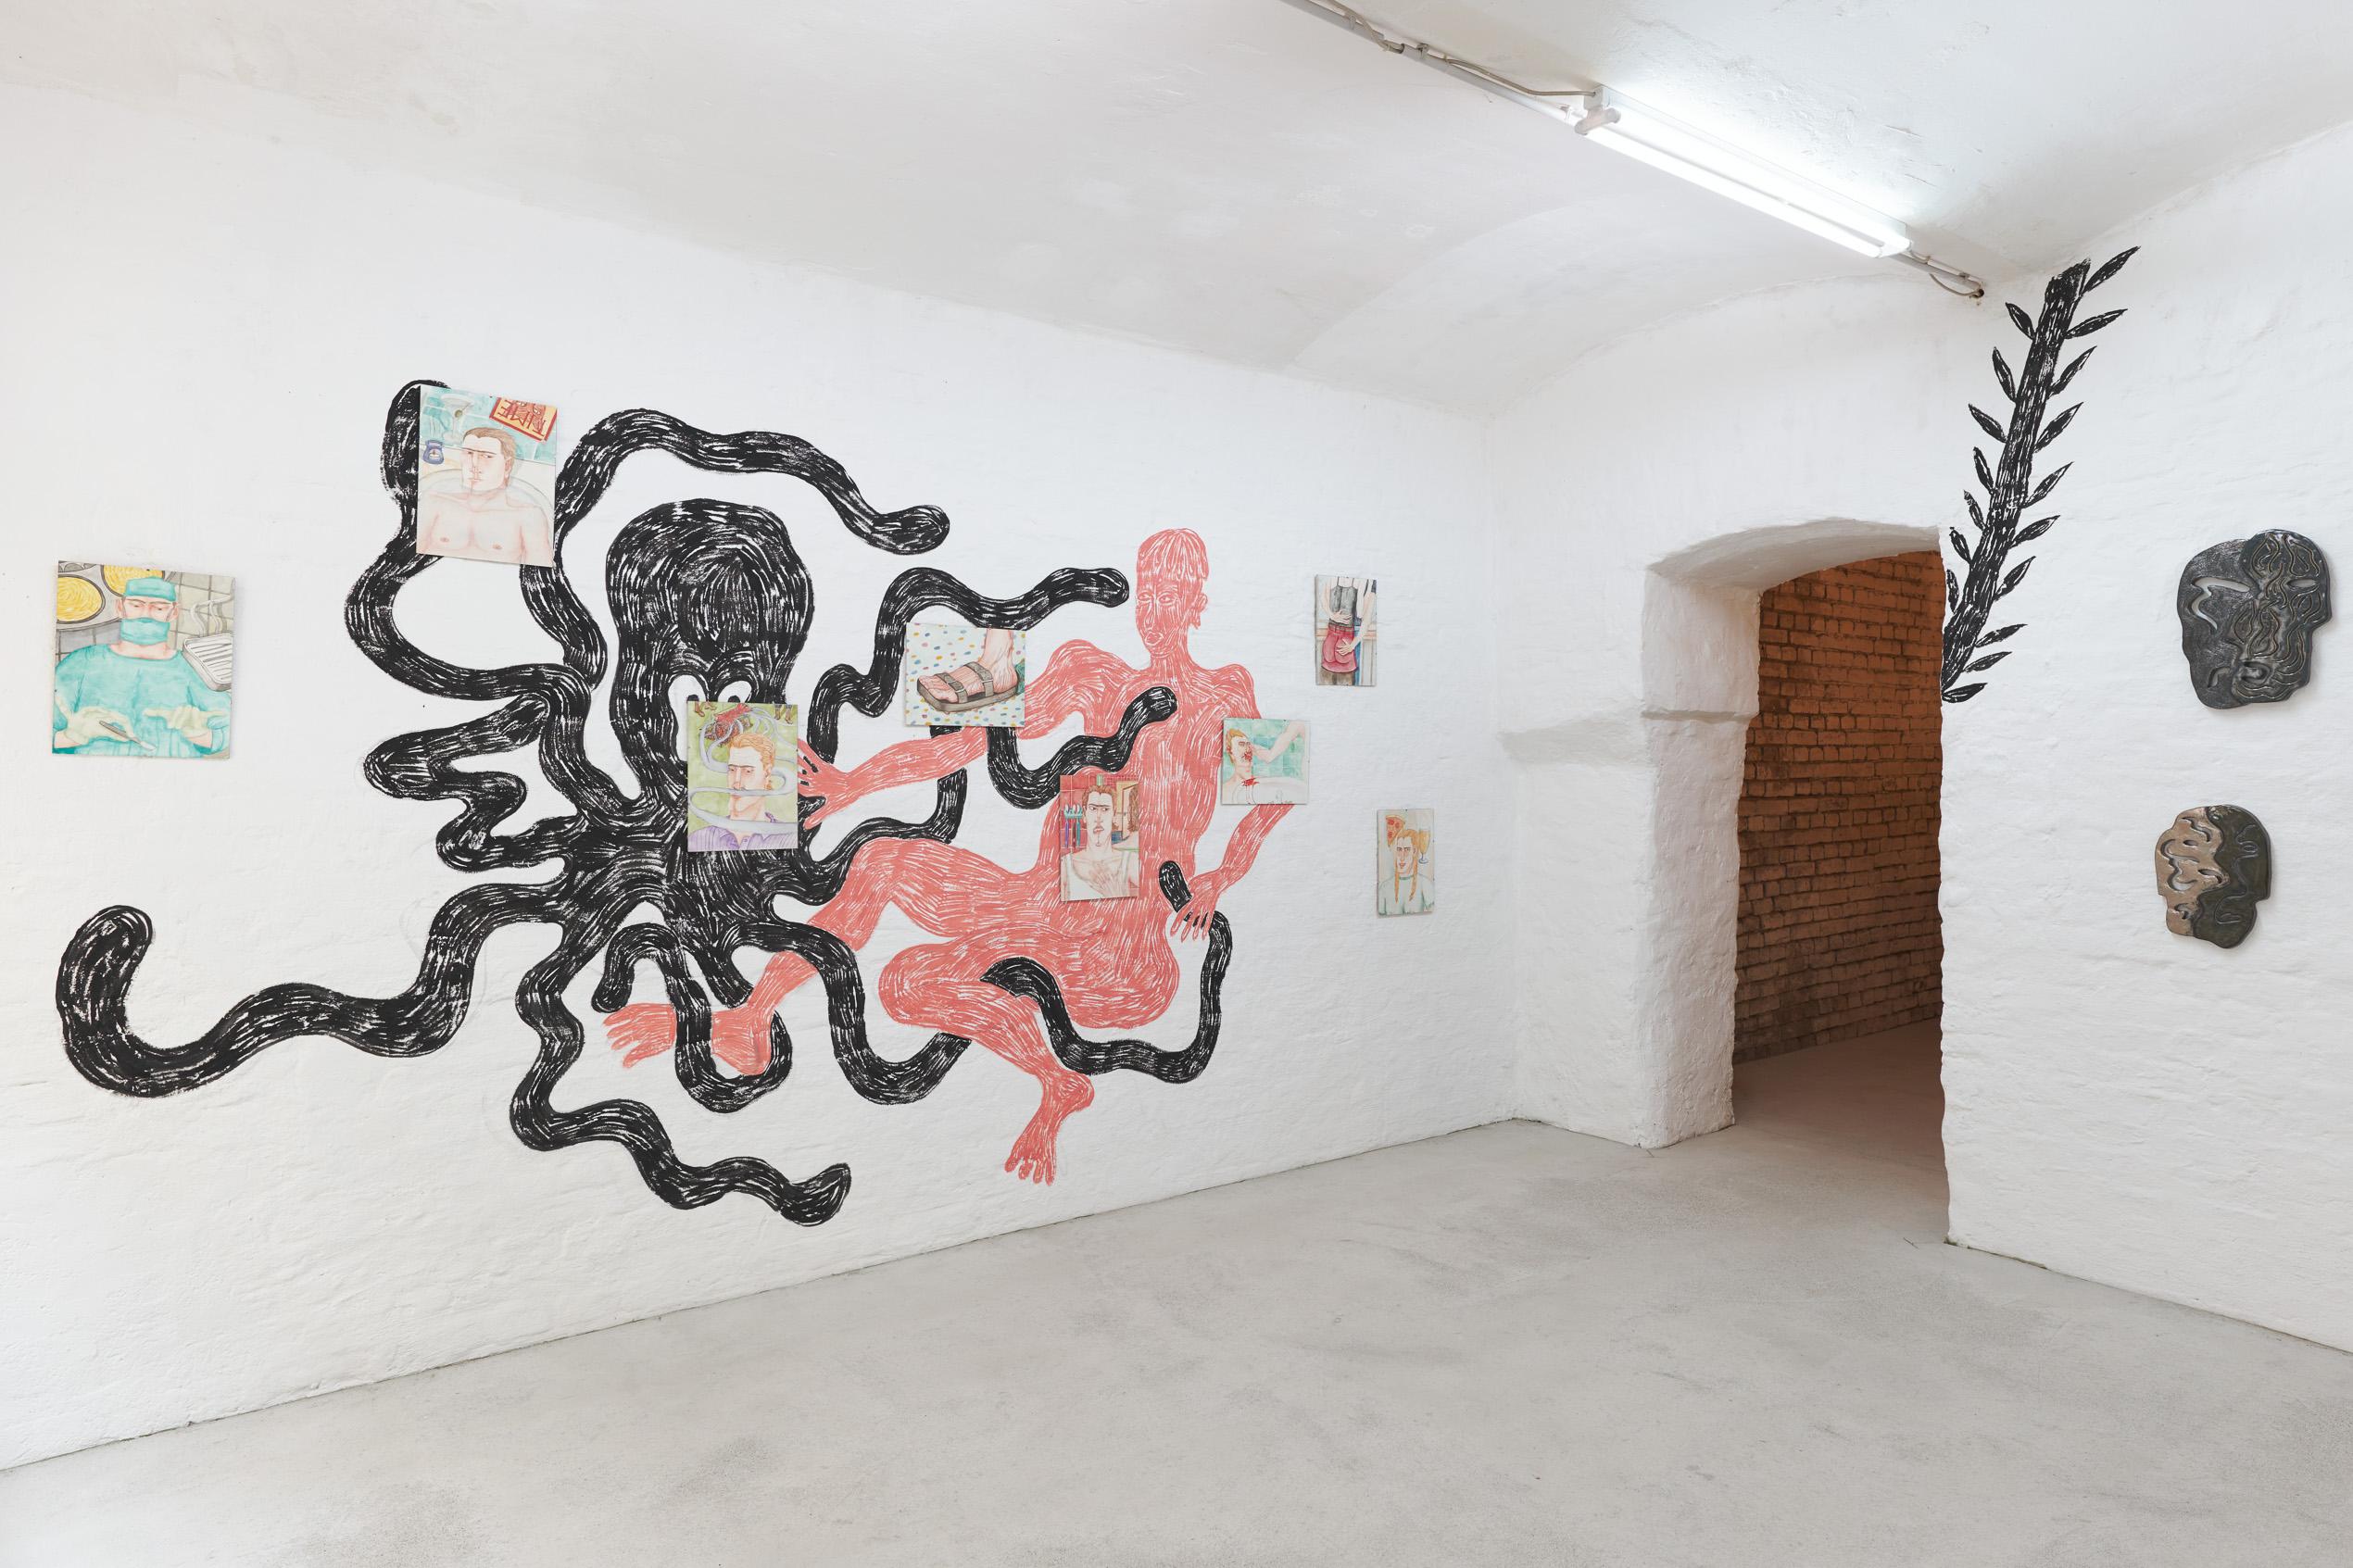 Exhibition view (Rade Petrasević, Axel Johnsson, Monika Grabuschnigg)